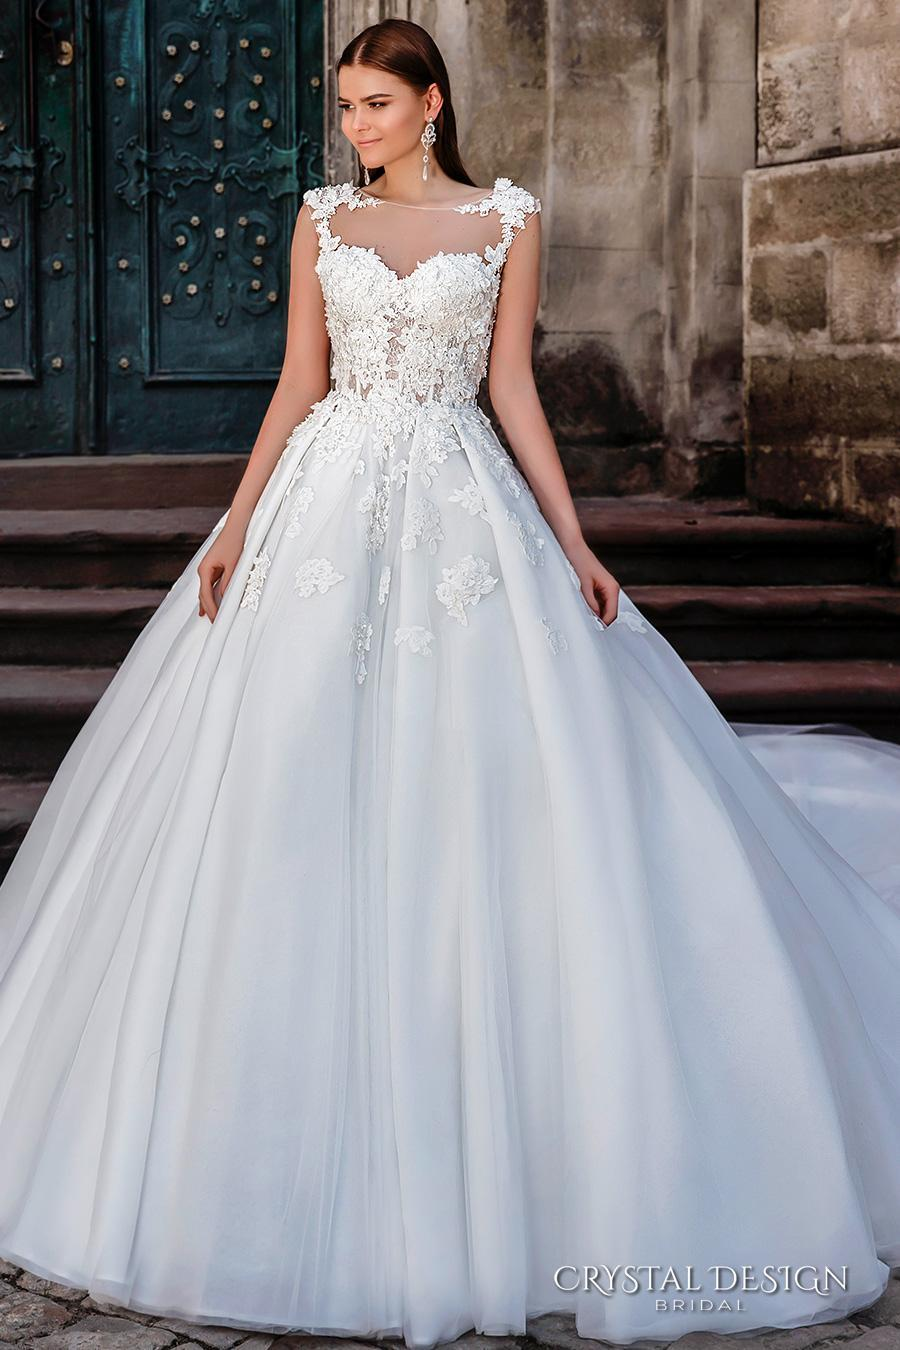 modern day wedding dresses photo - 1